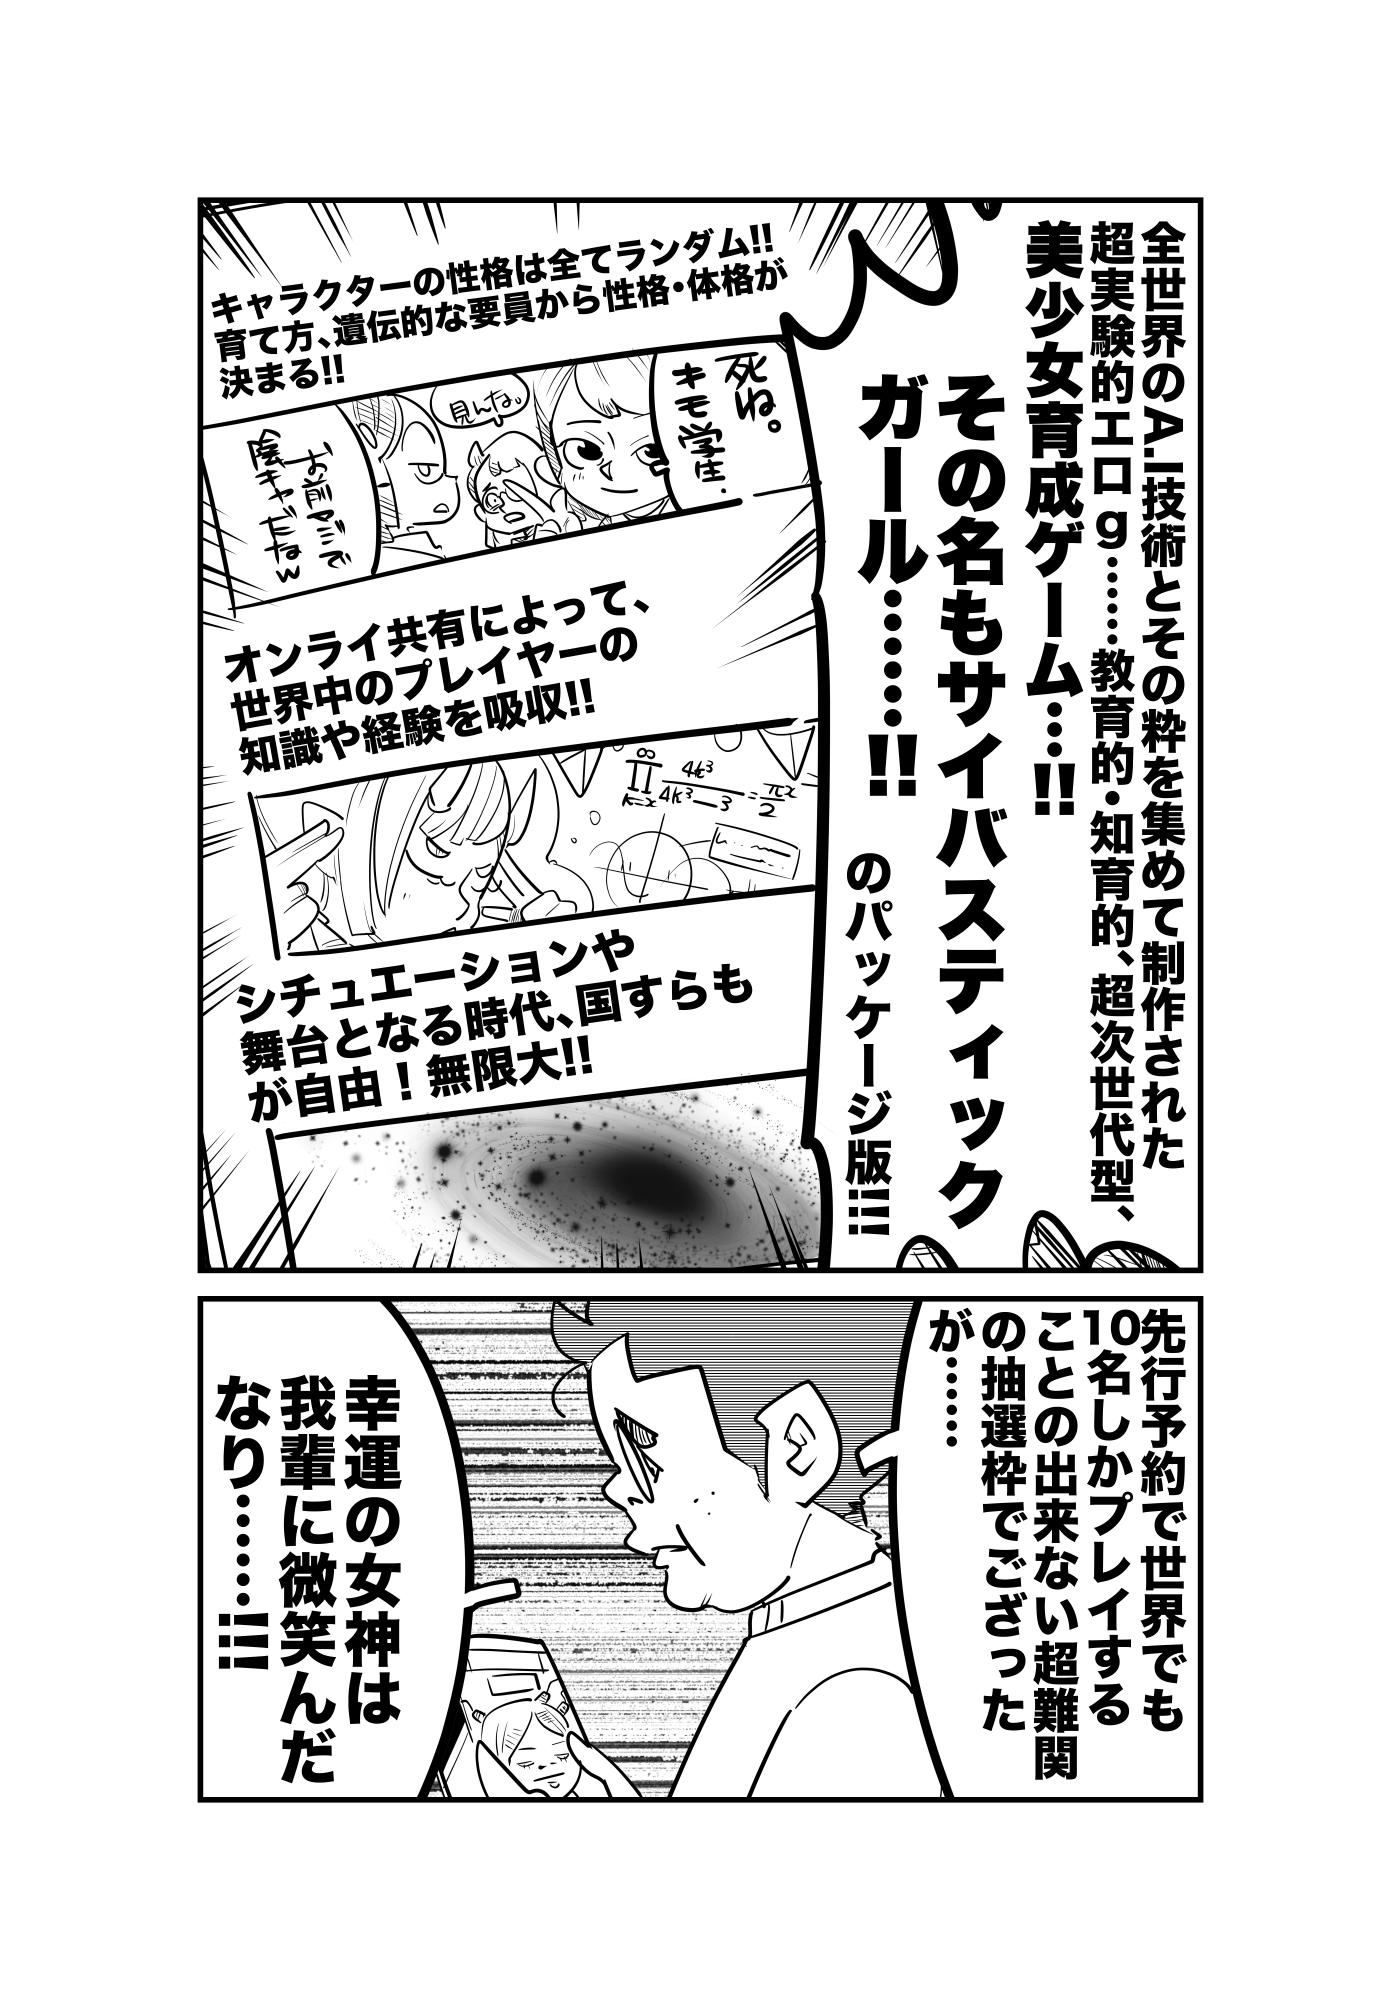 f:id:terashimaru117:20210915004357p:plain